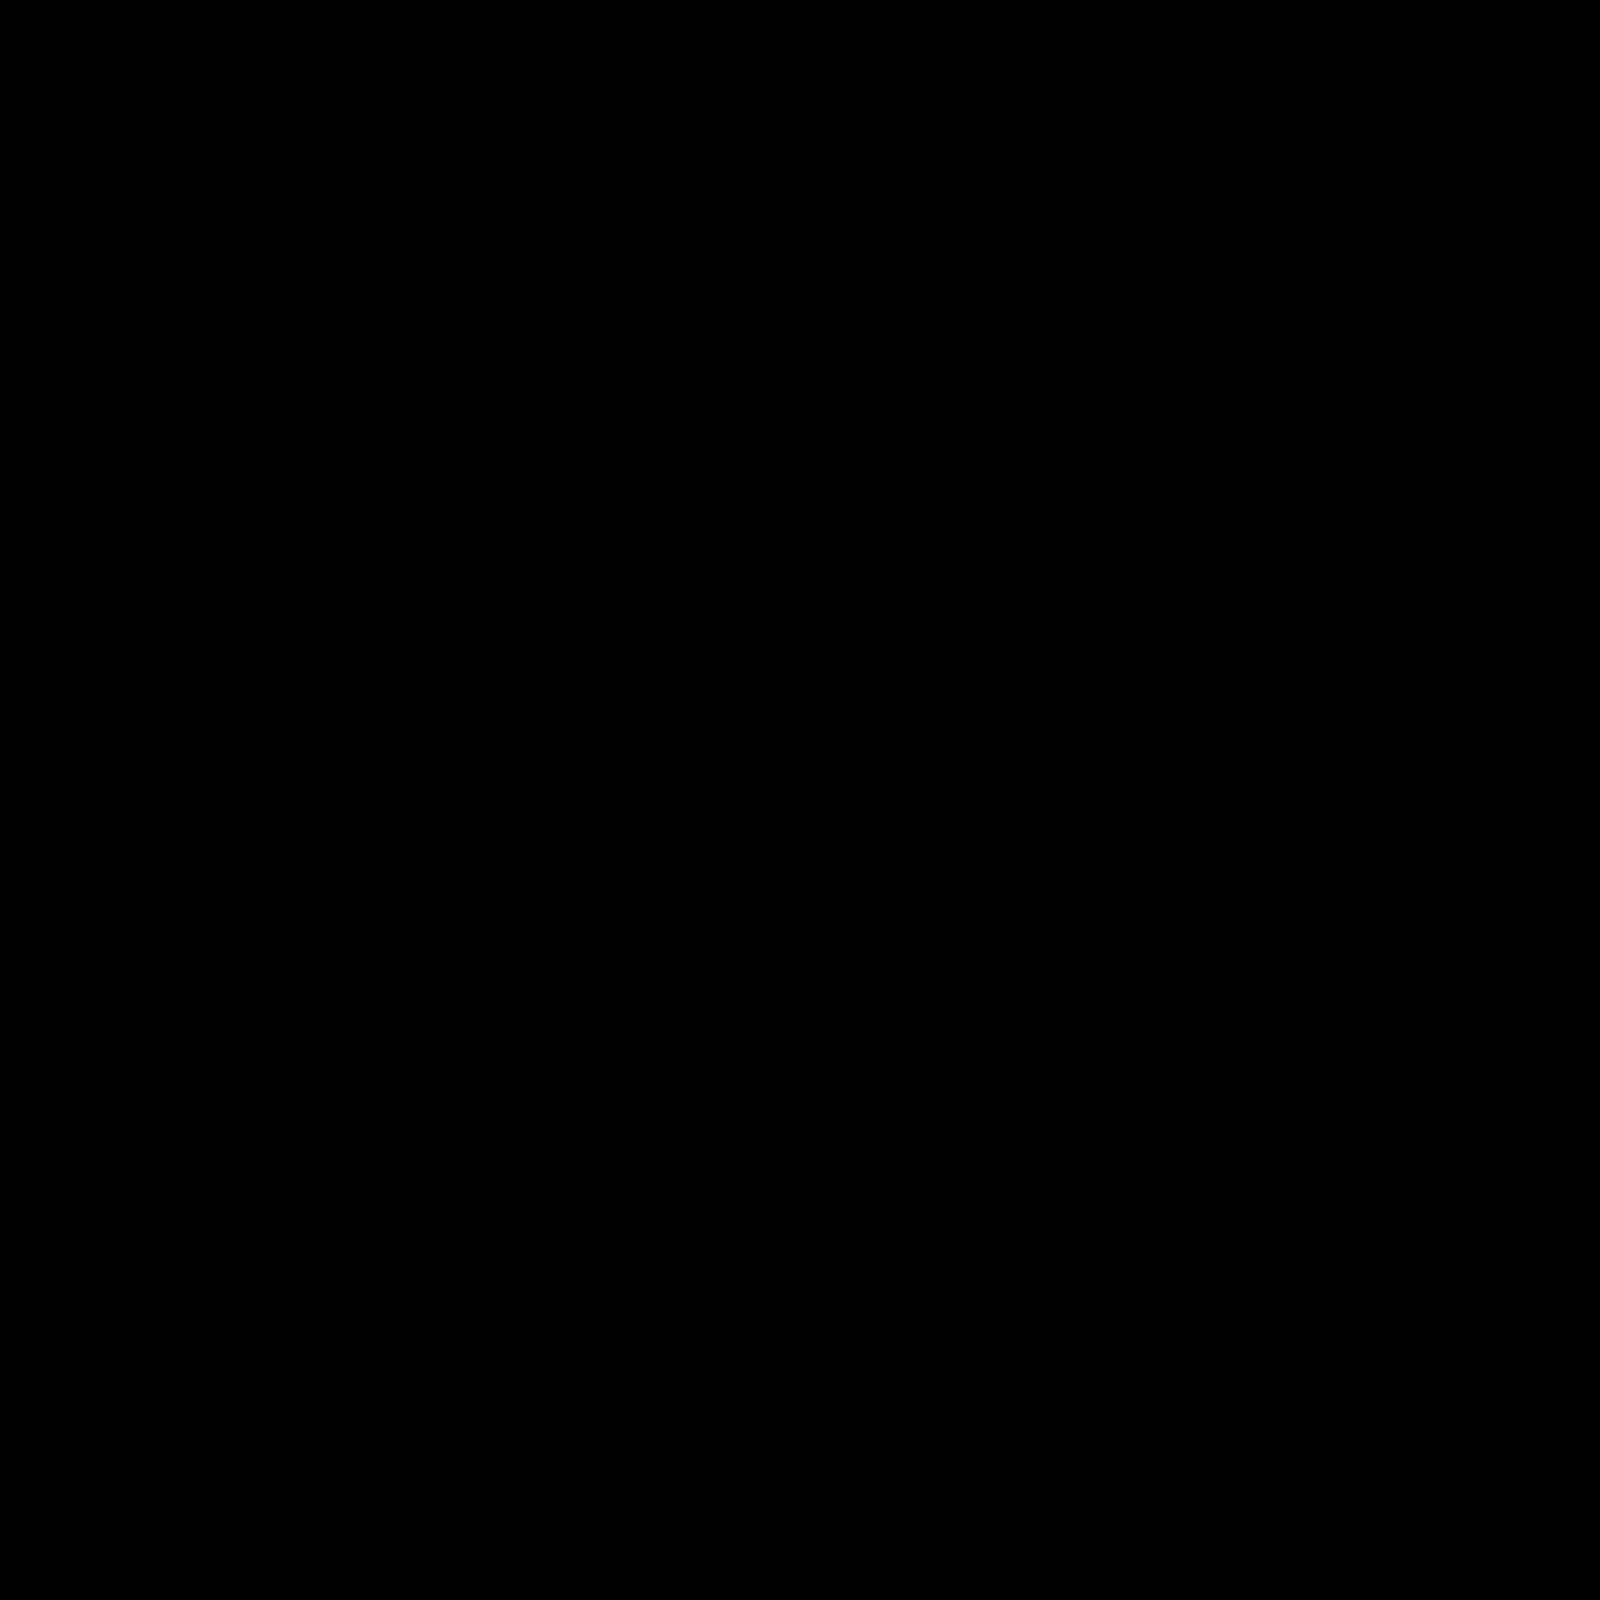 Мужчина icon